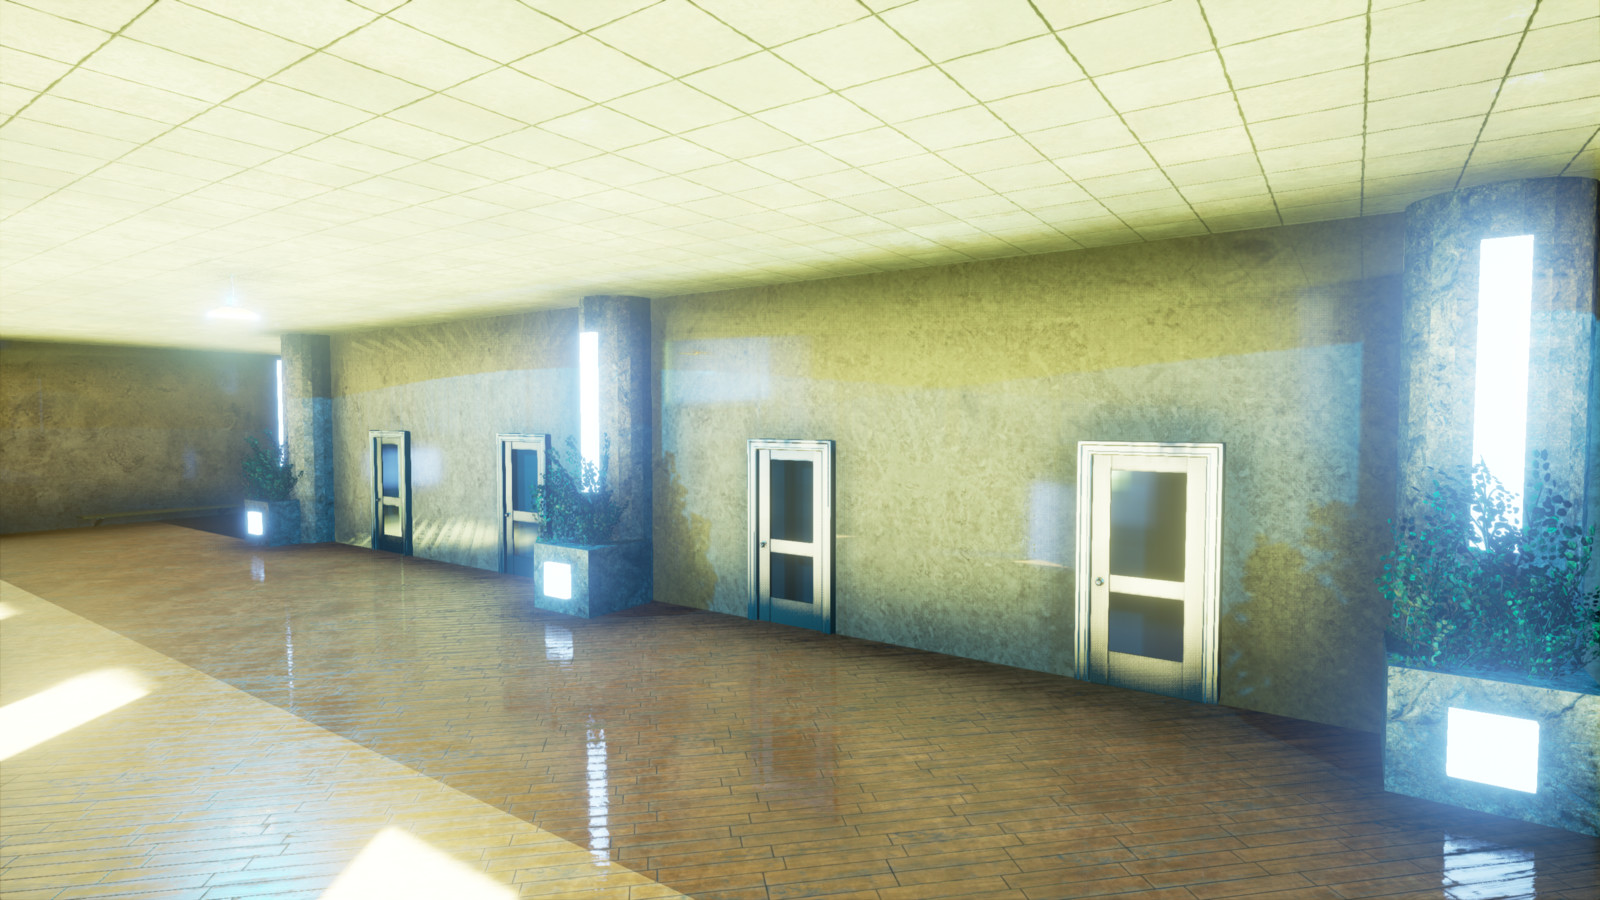 Shot #5 - Corridor